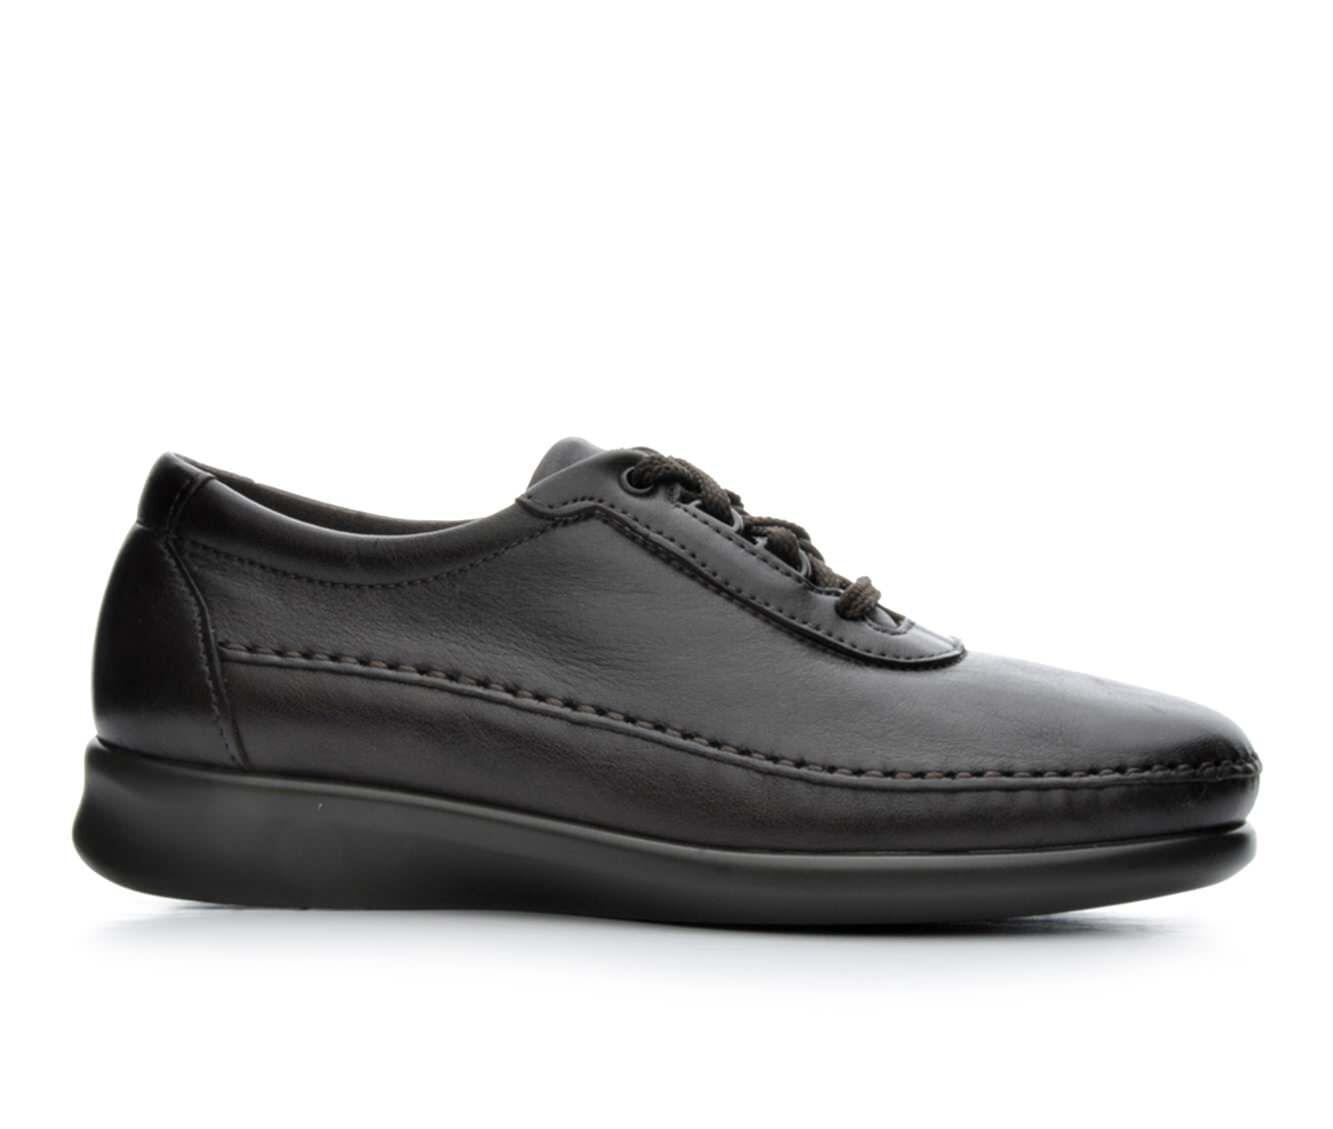 Buying New Women's Sas Traveler Comfort Shoes Dark Brown